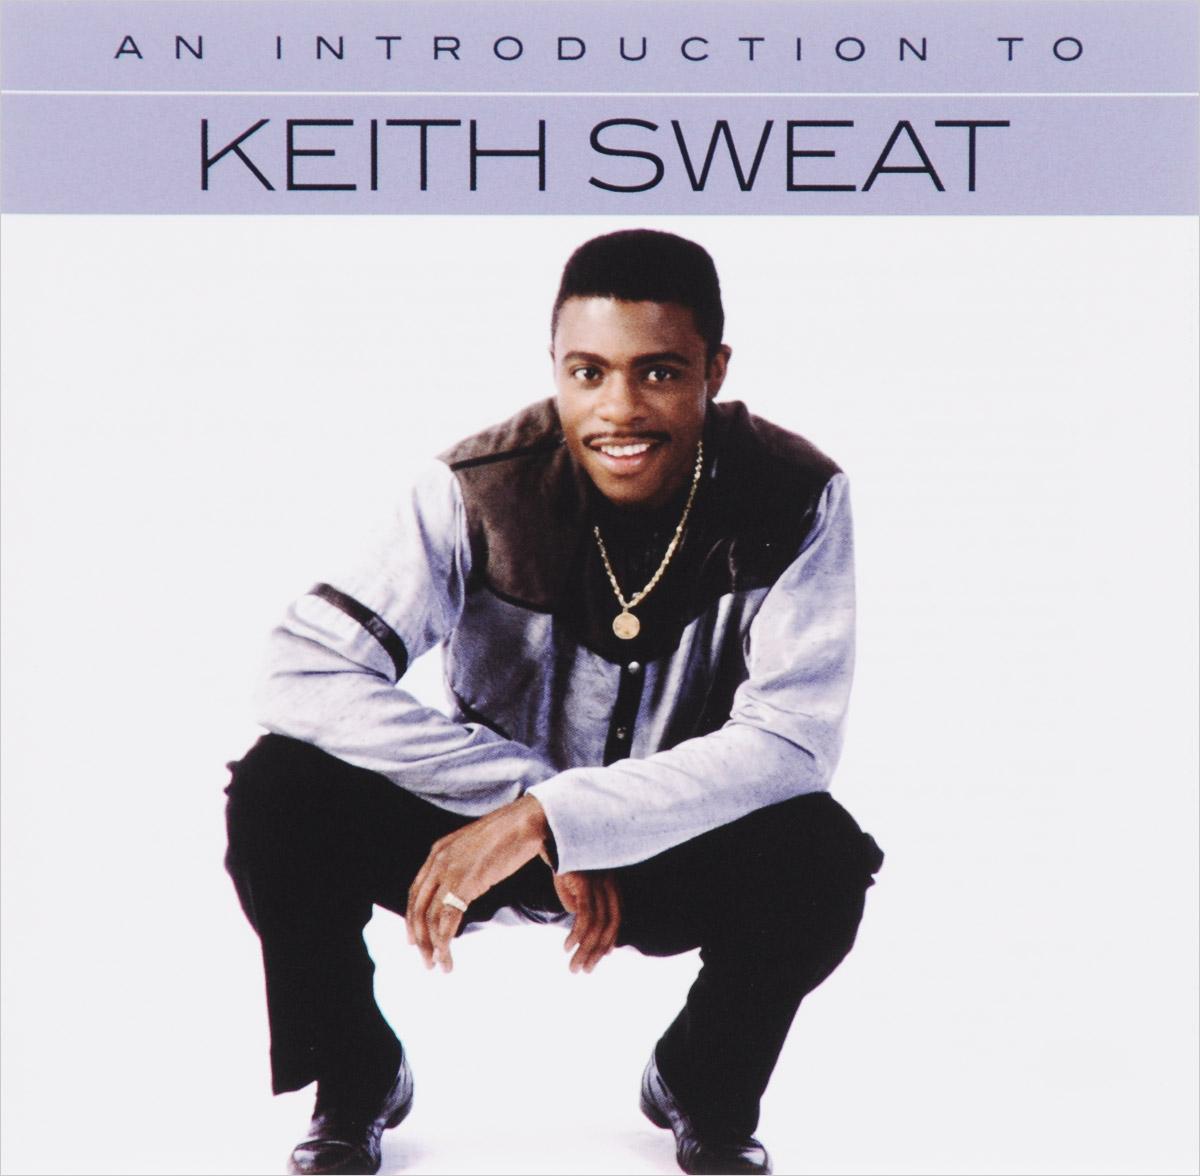 Кейт Свит,Джаки Макгхи,Асена Кэйг,Кат Клос Keith Sweat. An Introduction To Keith Sweat цена в Москве и Питере